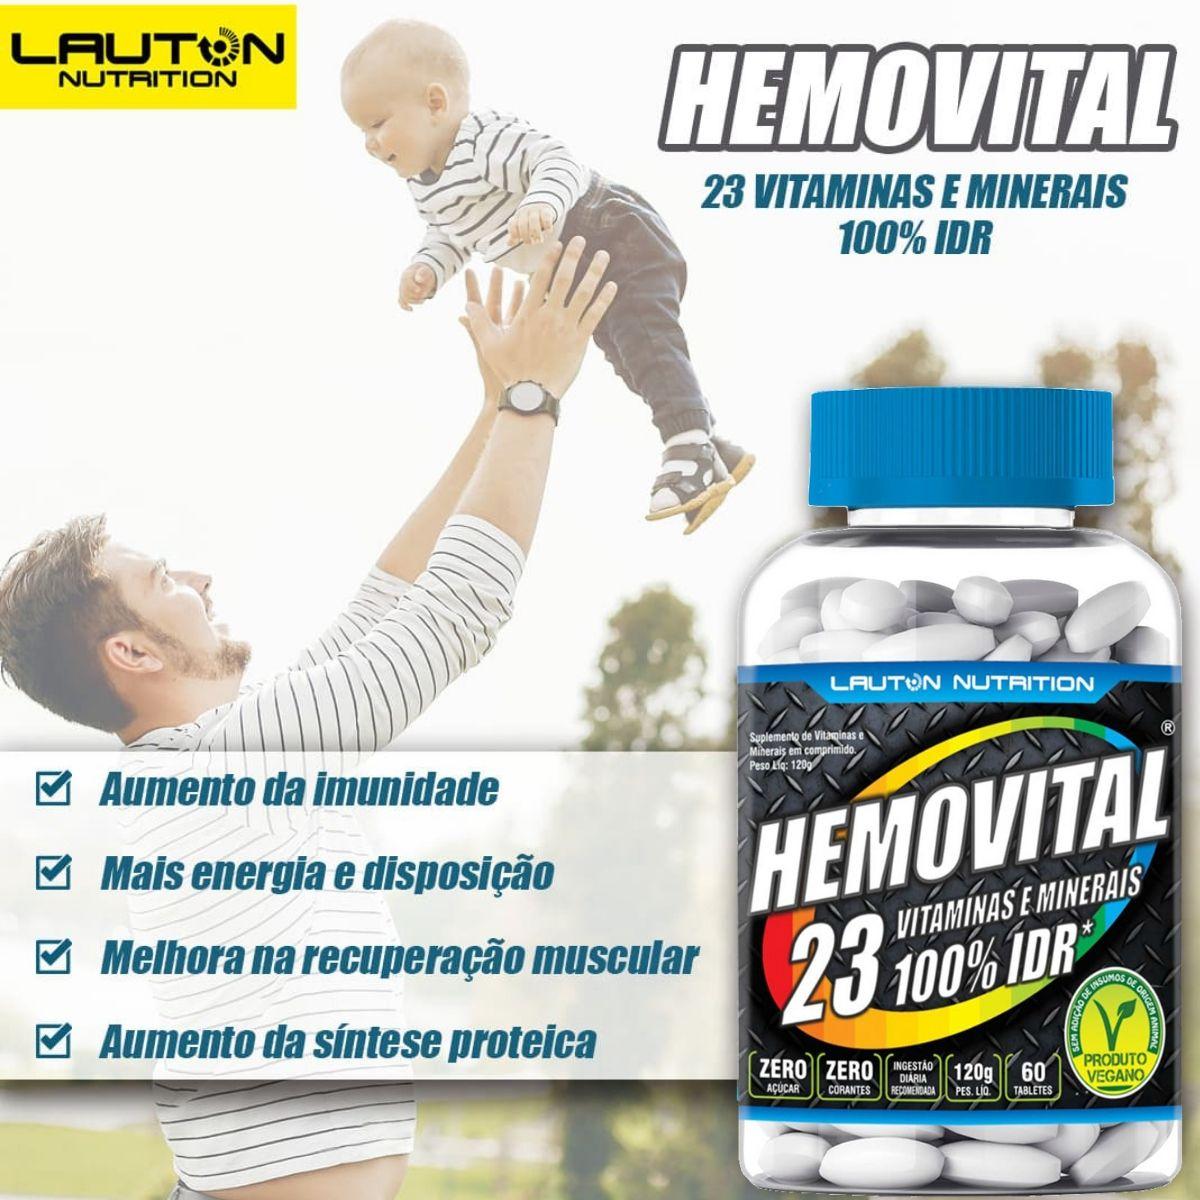 Hemovital-Polivitaminico-Multivitaminico-Vitaminas-Minerais